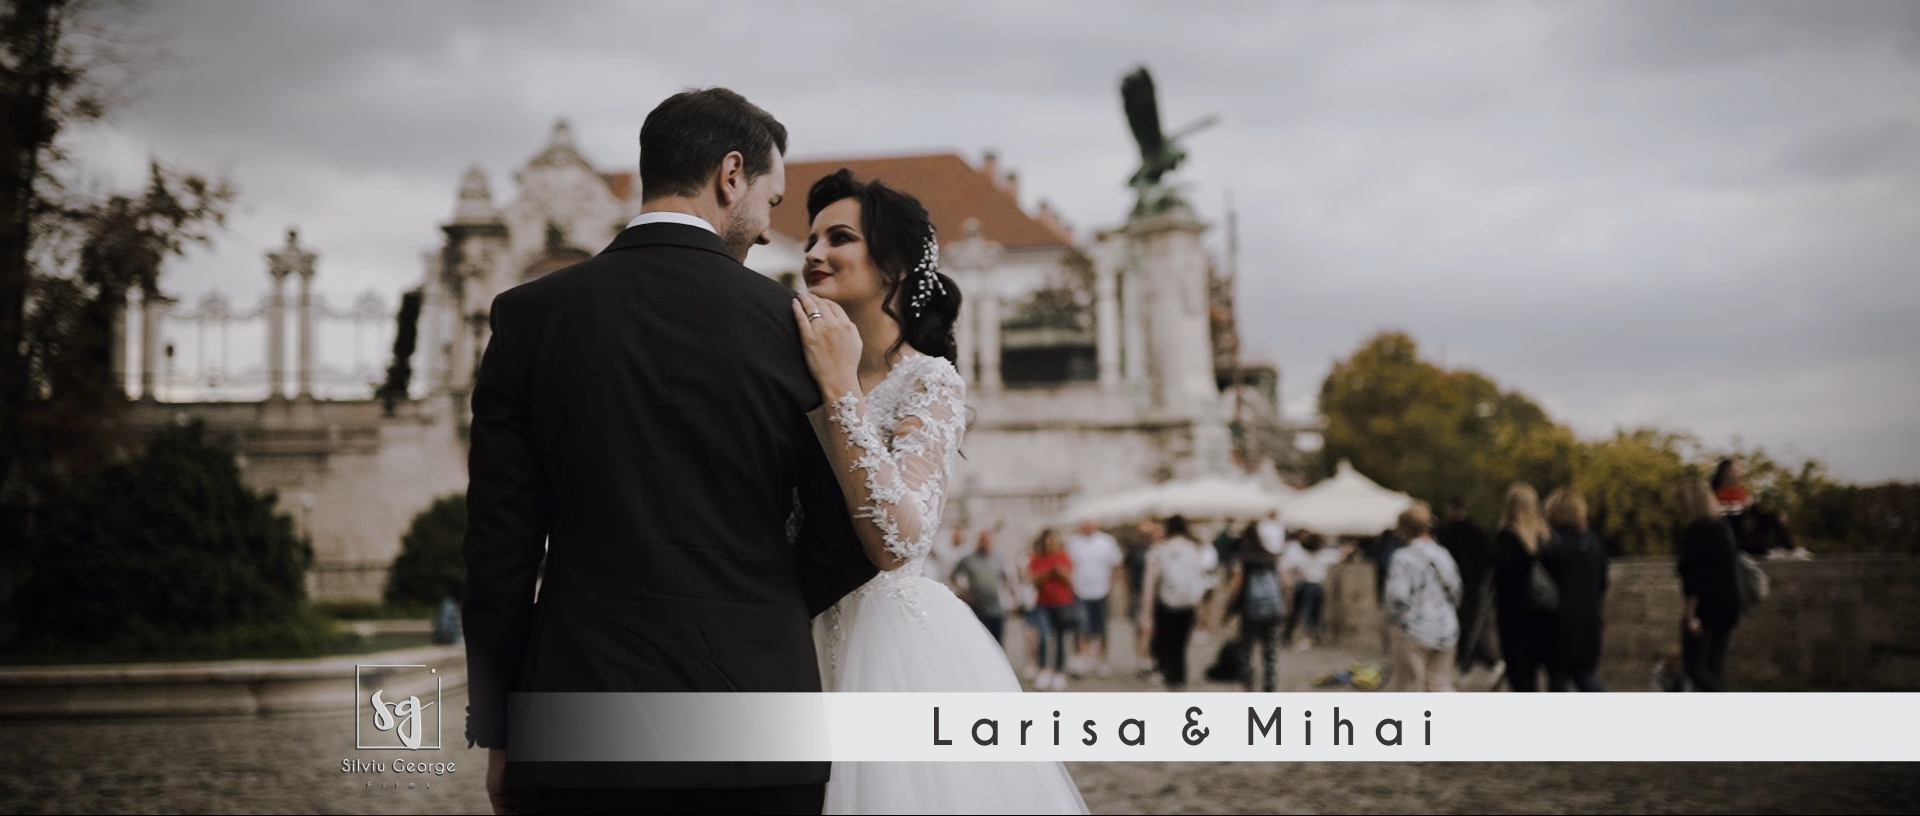 thumbnail Larisa & Mihai